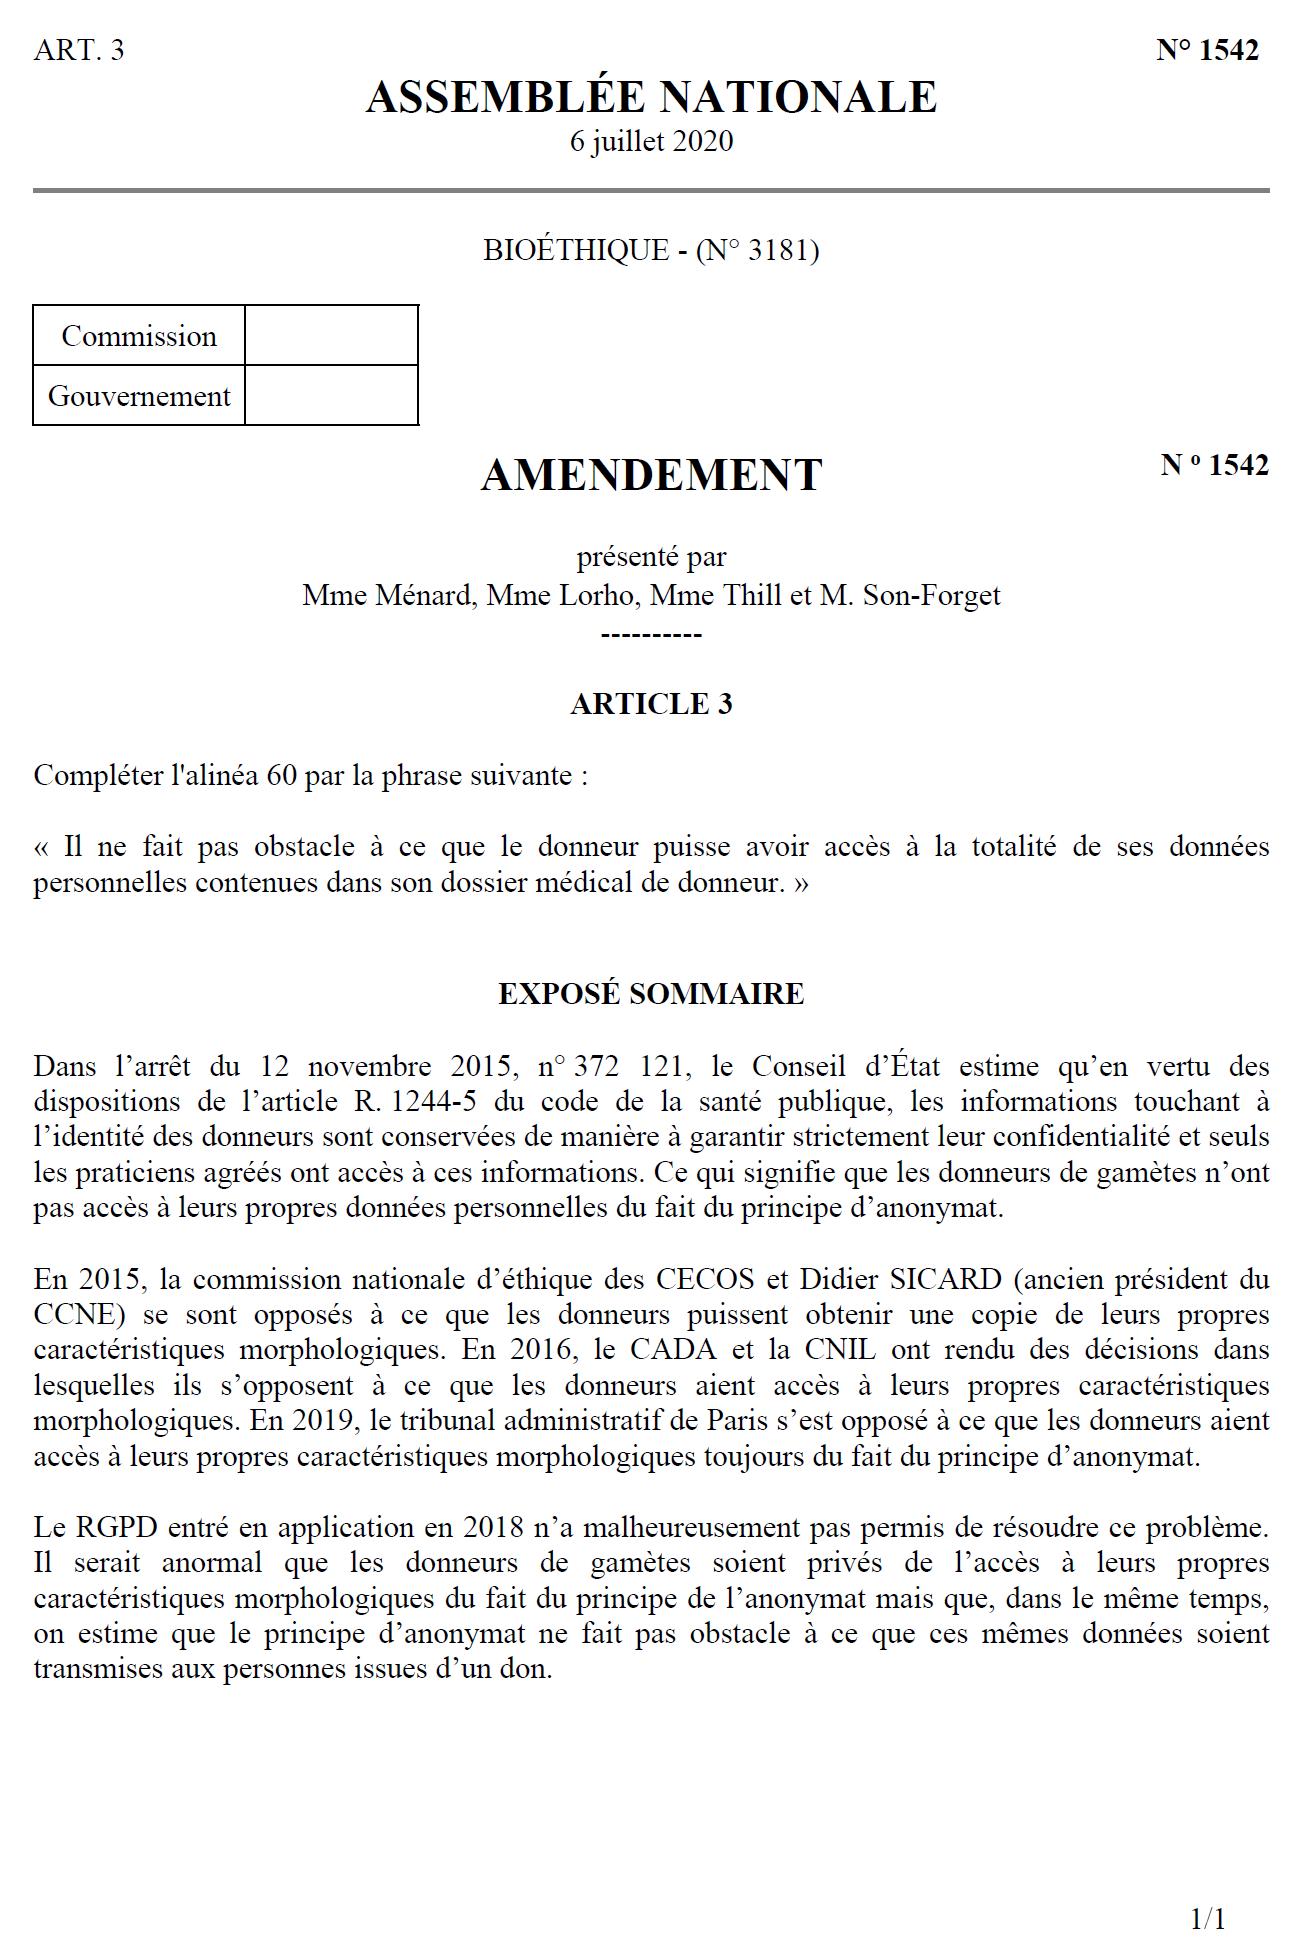 amendement 1542